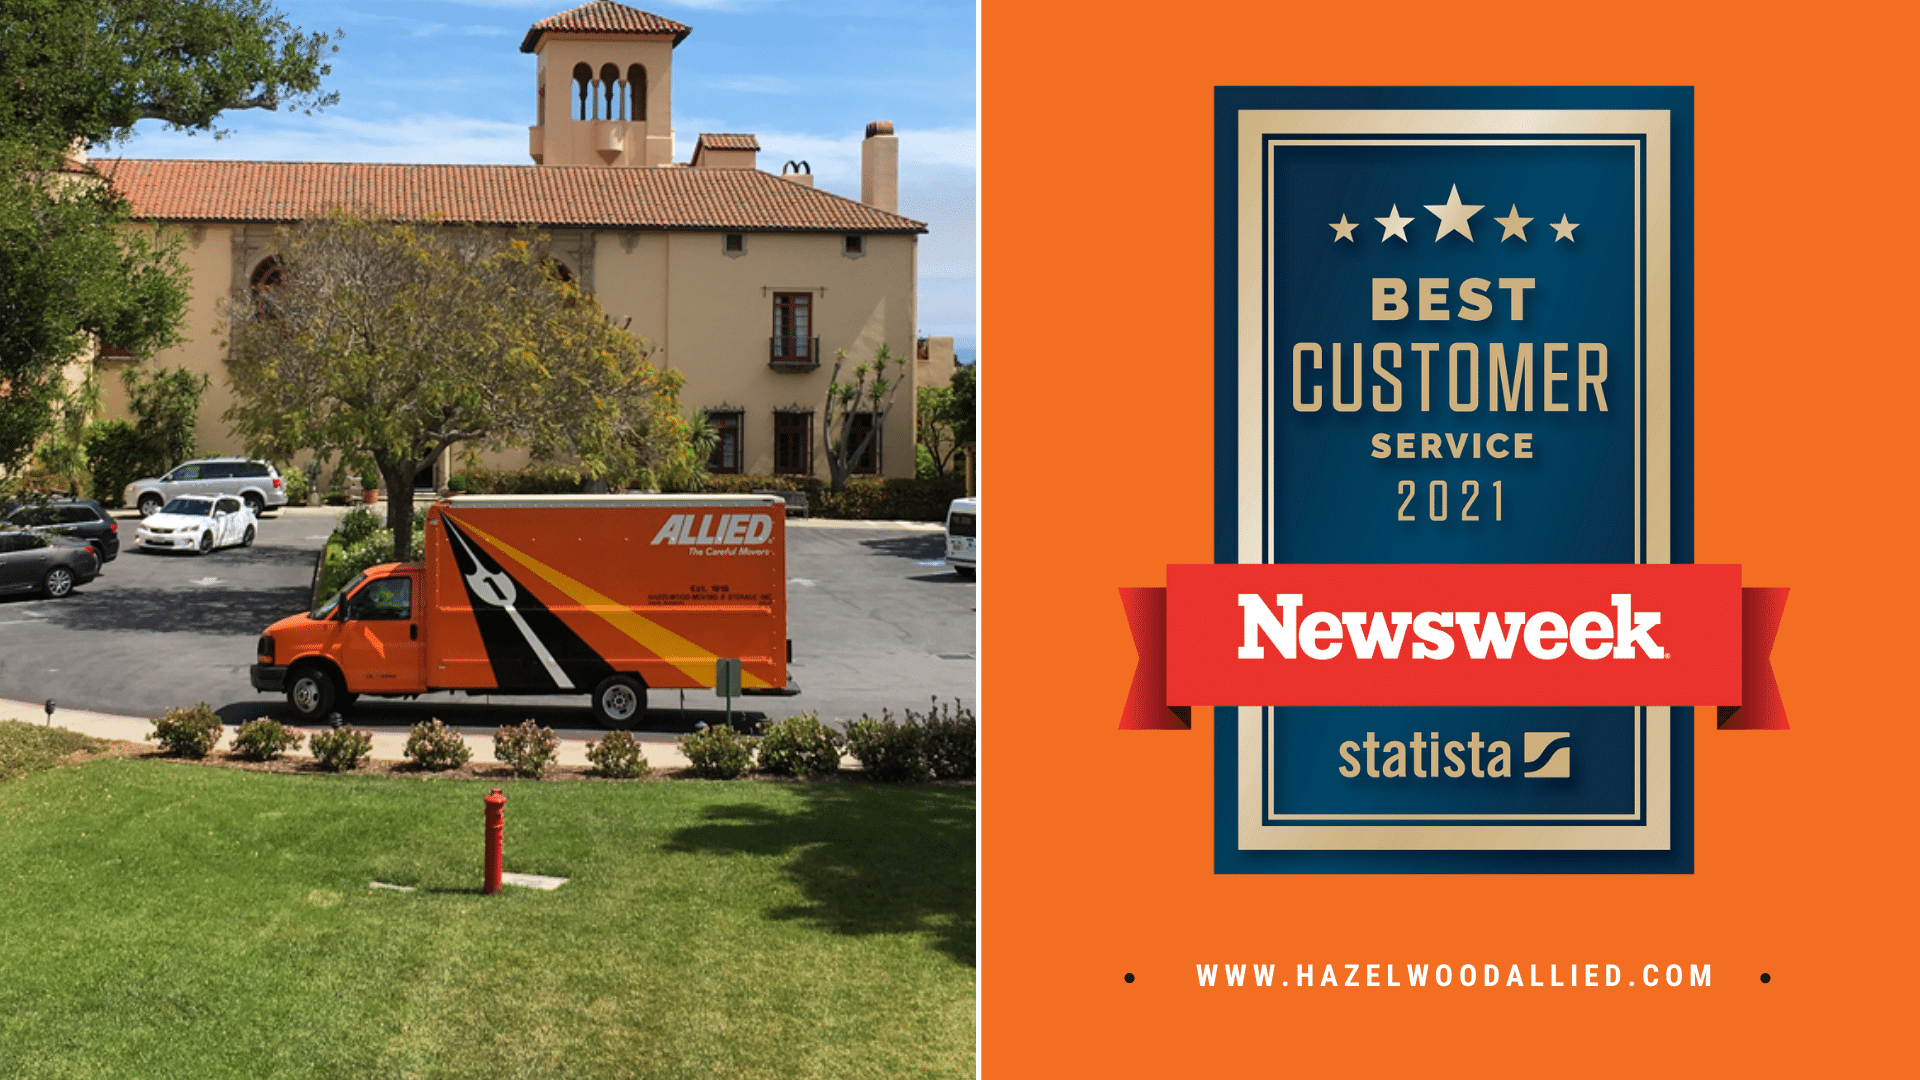 Moving Company Best Customer Service